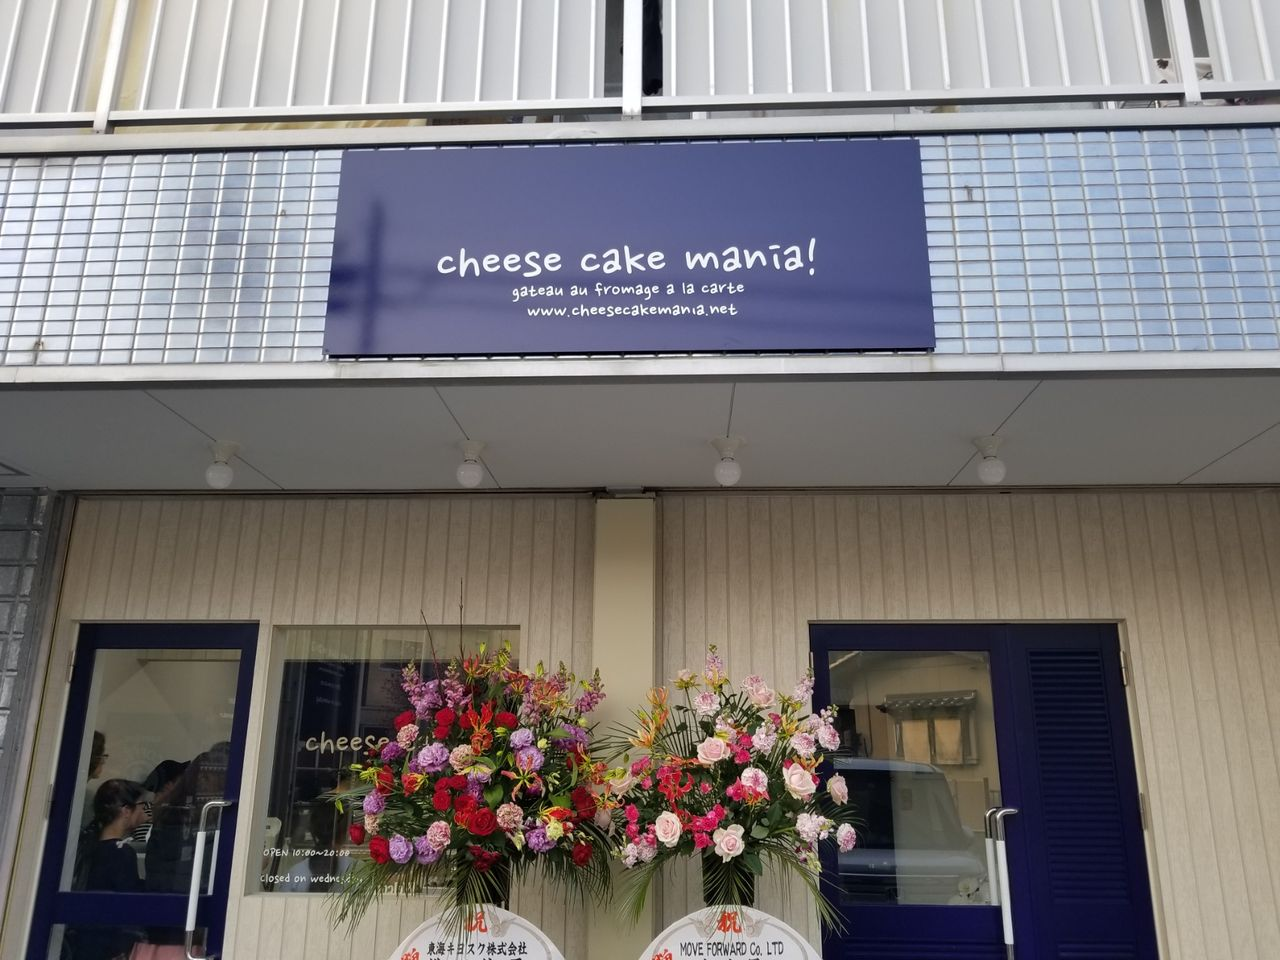 『cheese cake mania!(チーズケーキマニア!) 』店舗外観